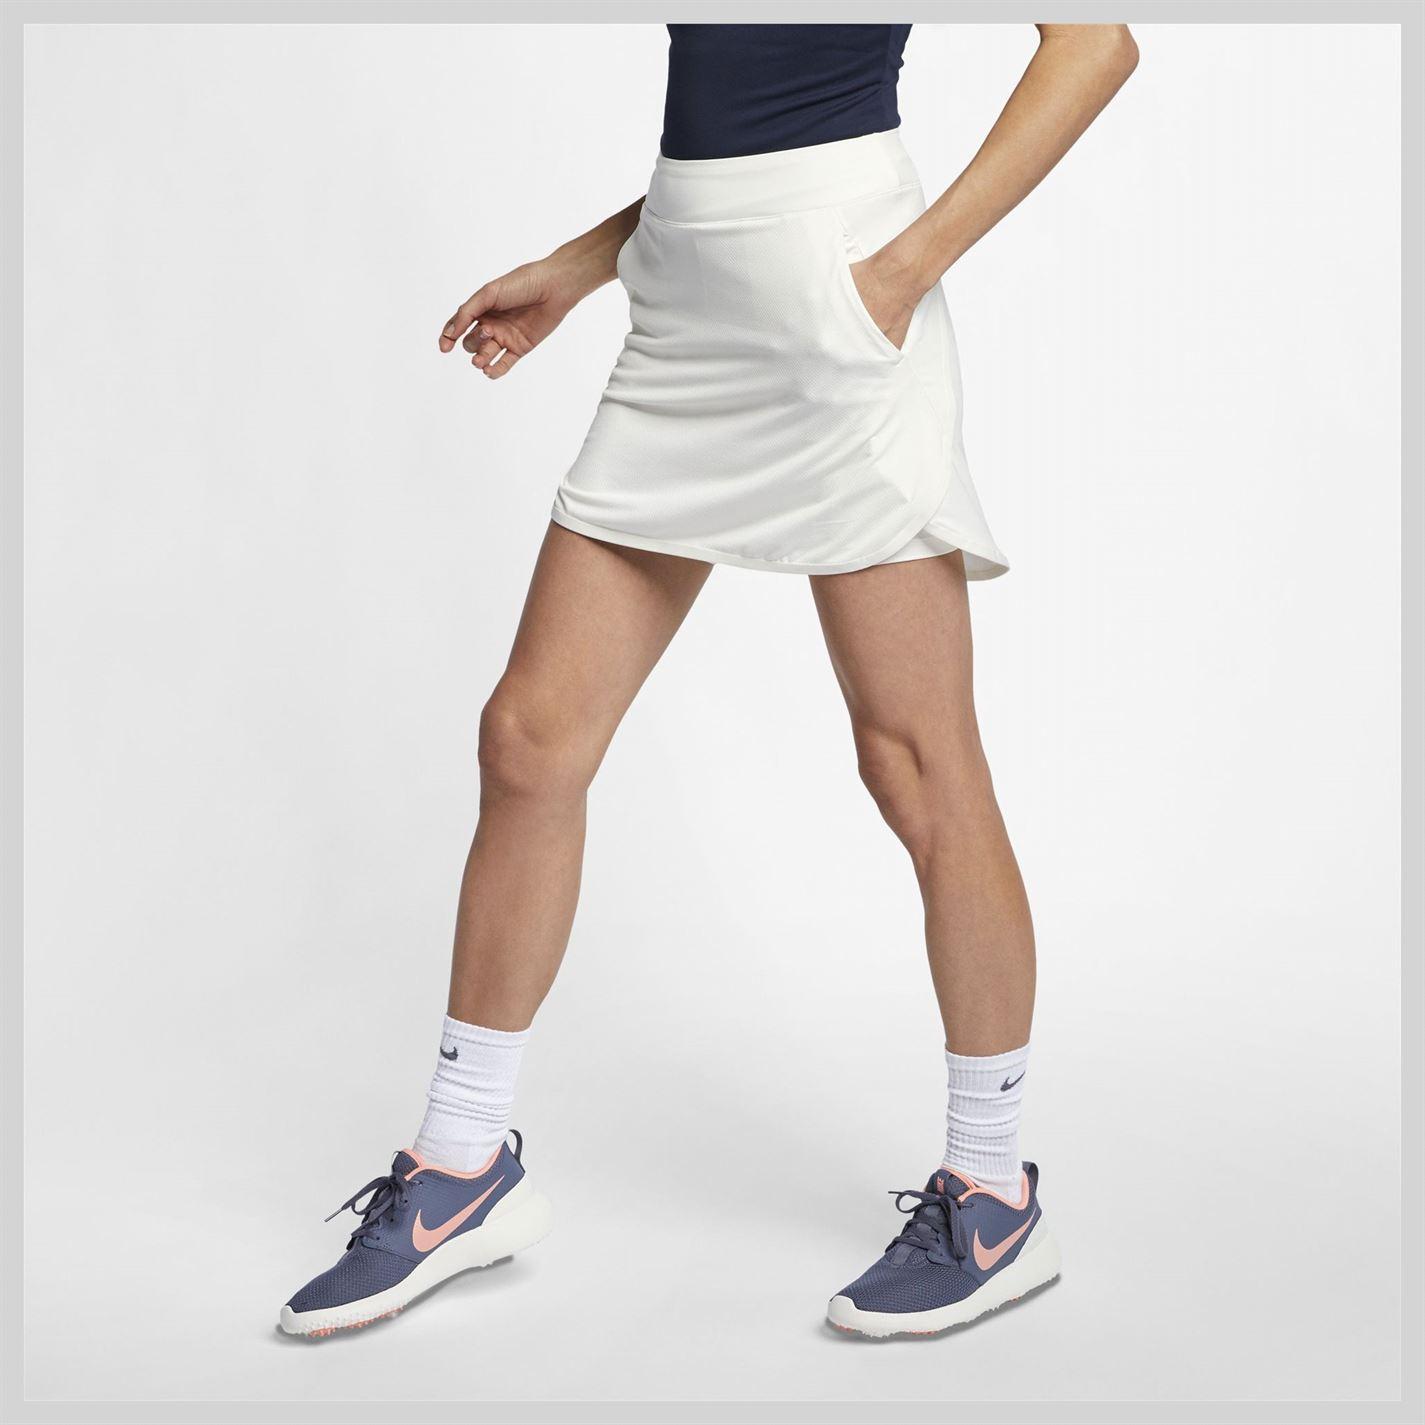 Nike Dri FIT Skirt Ladies